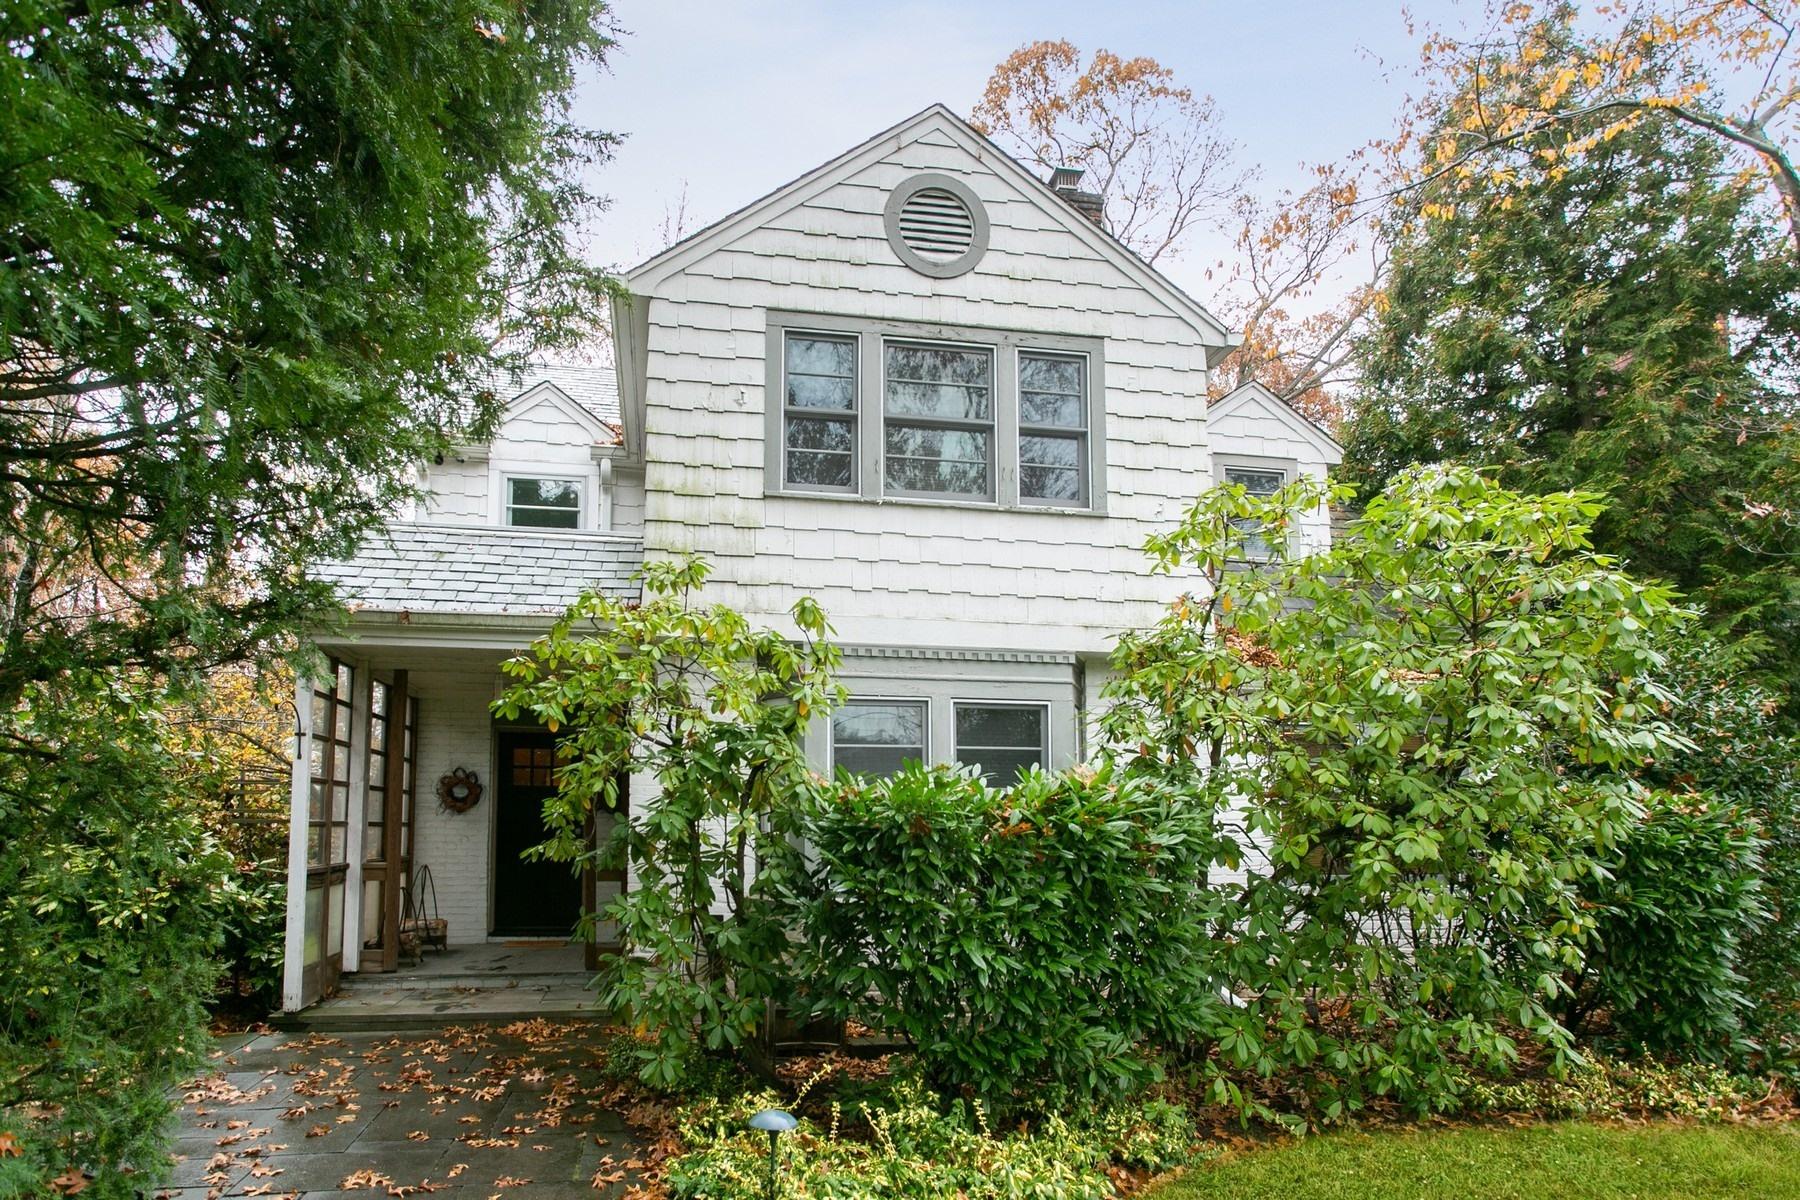 Single Family Homes for Sale at Oceanside 63 Patten Ave Oceanside, New York 11572 United States